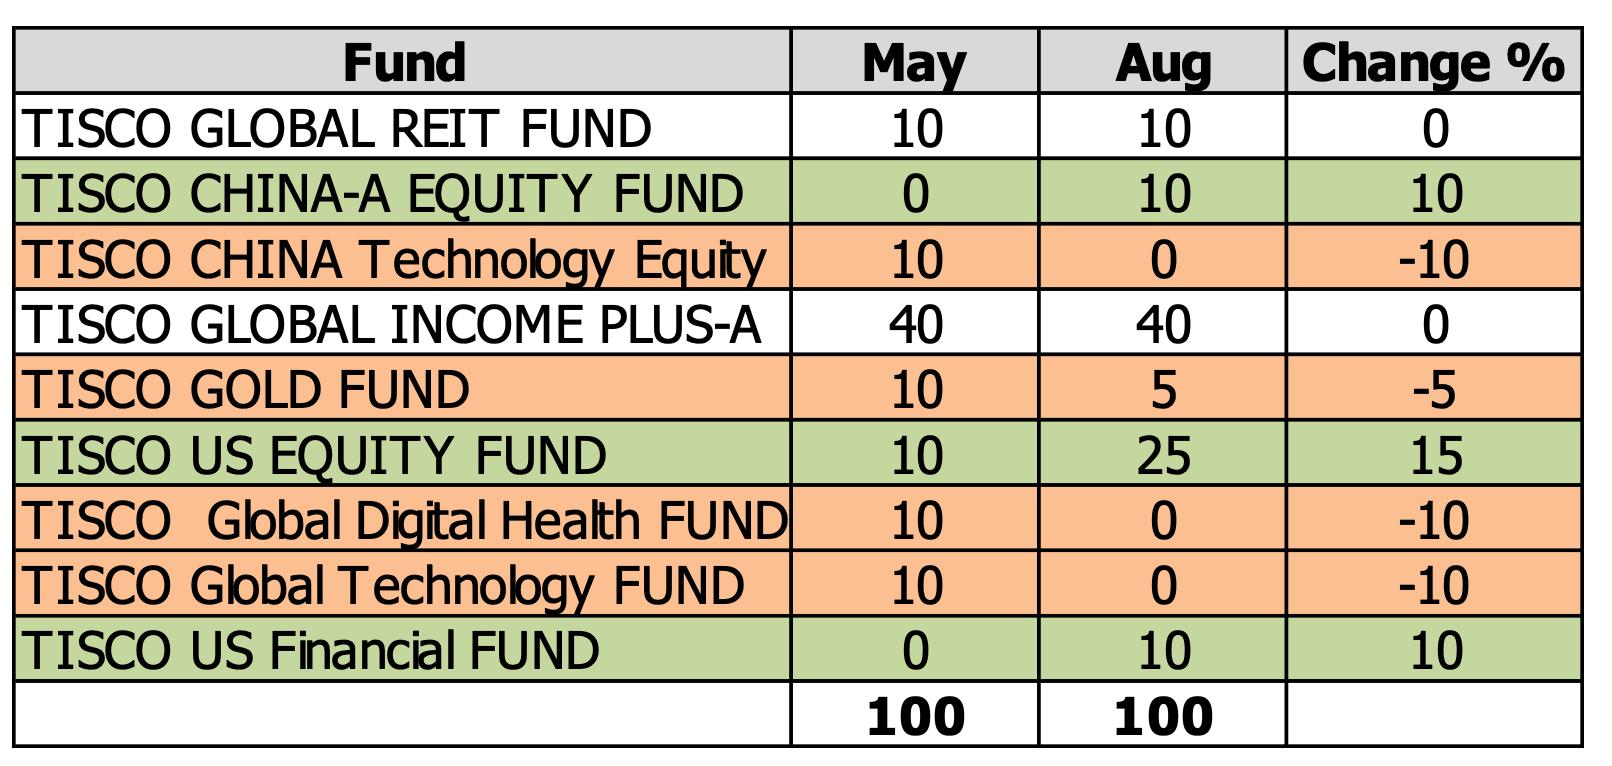 TISCO Omakase Extra Fund ปรับพอร์ตเดือน ส.ค. 2020: